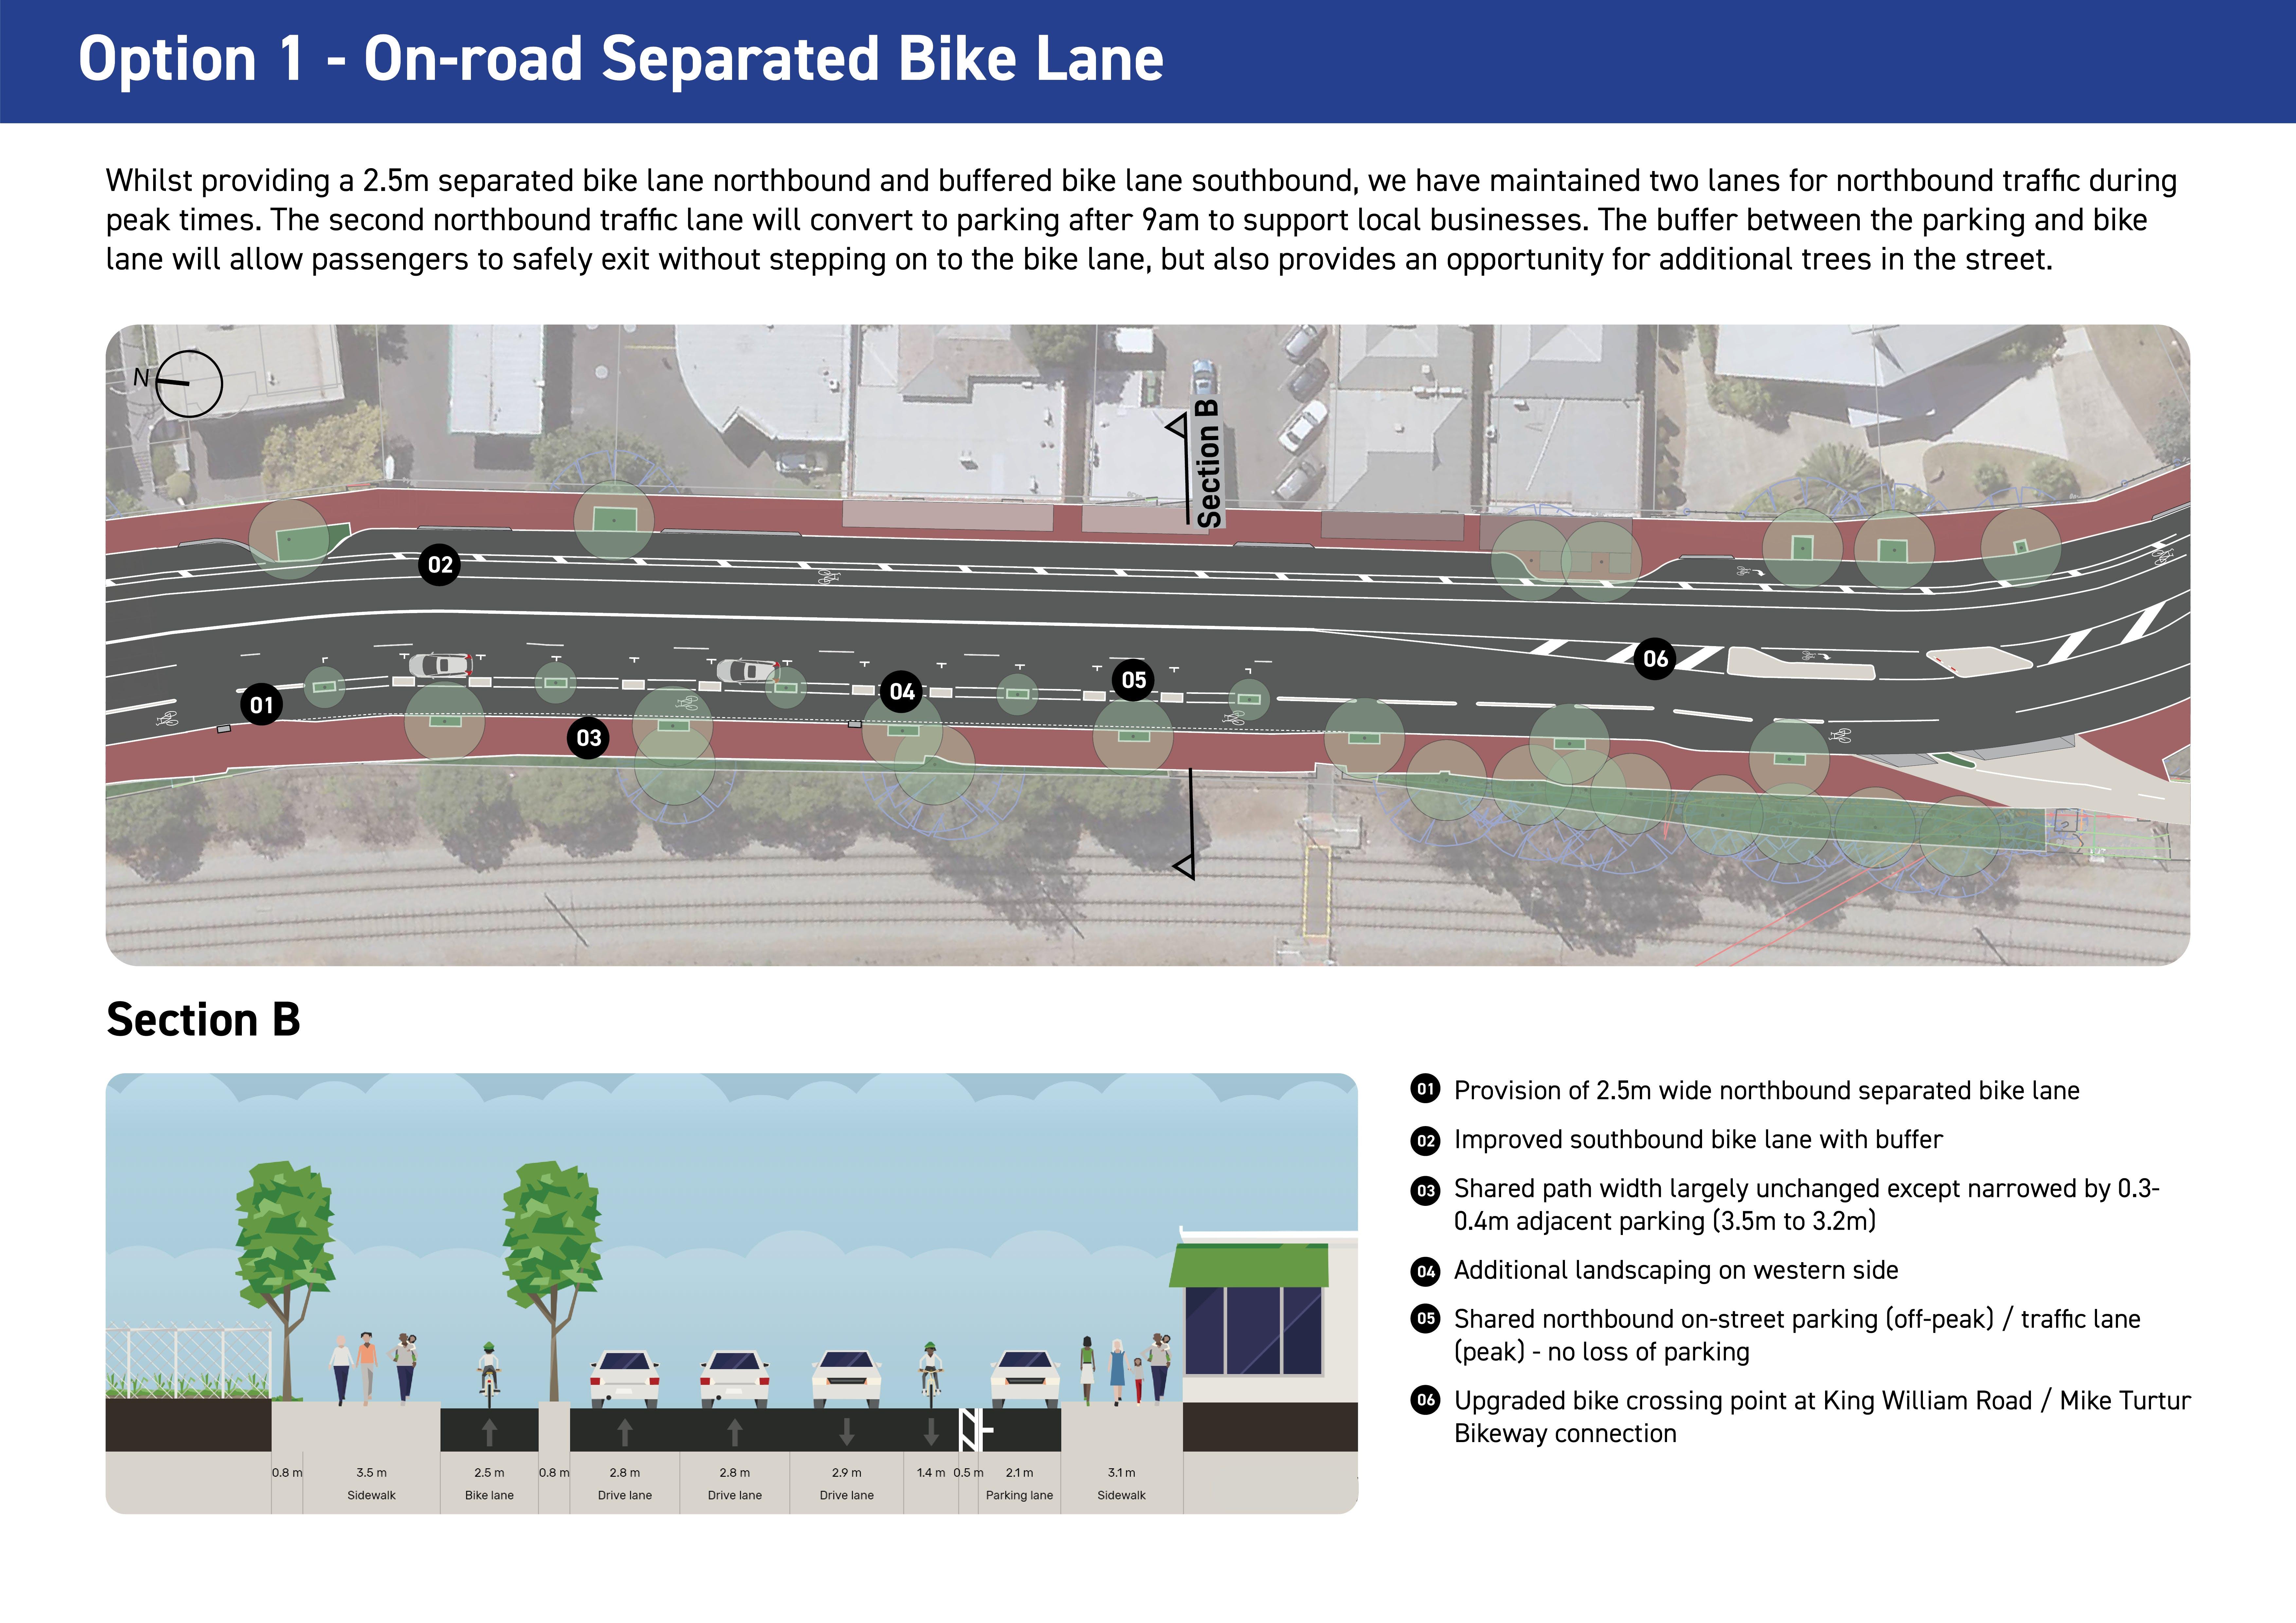 King William Road Bikeway Option 1 (southern half)